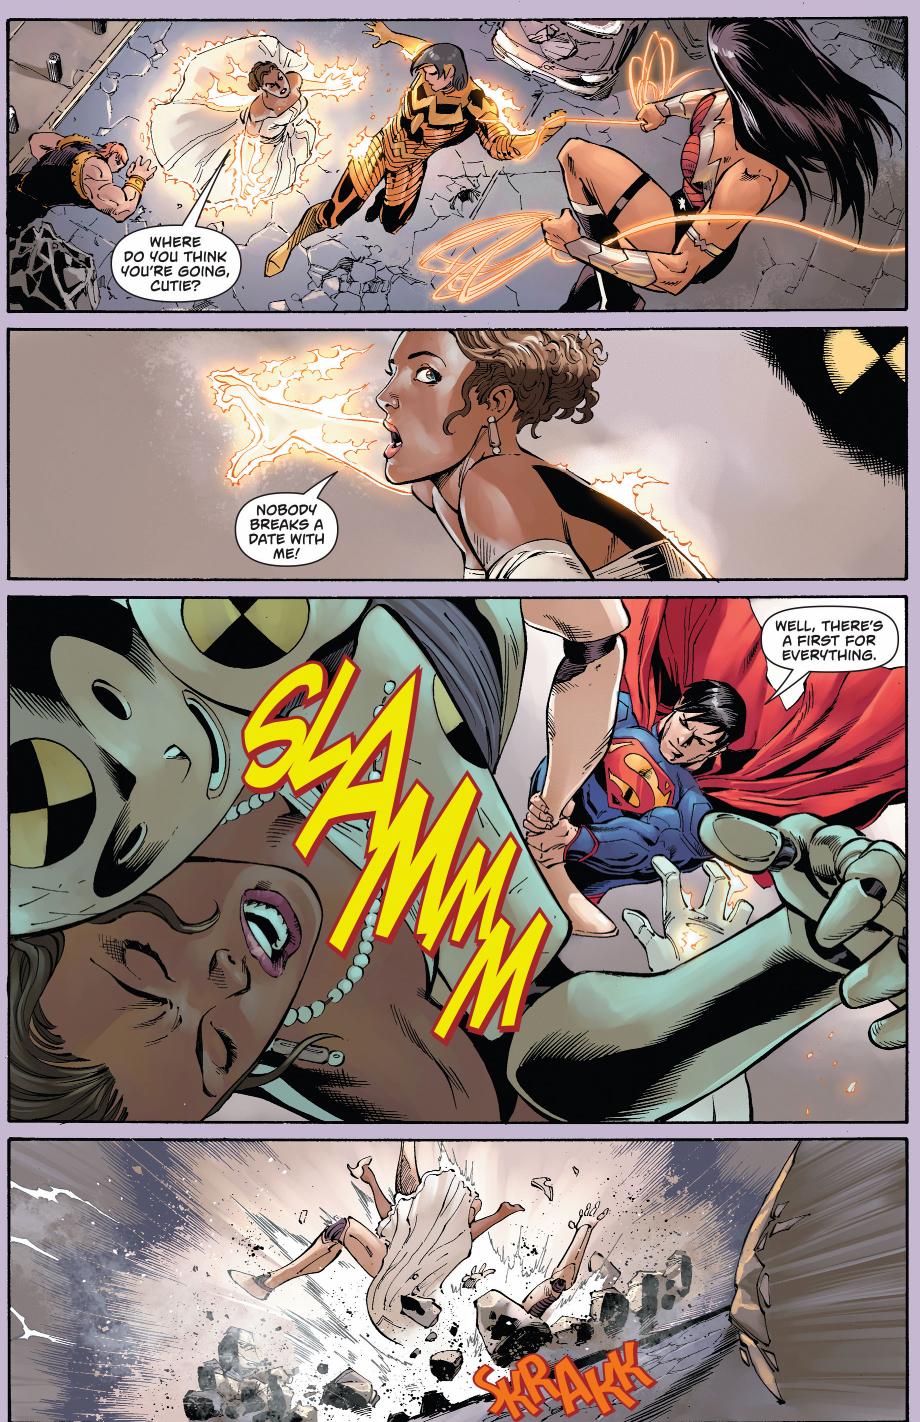 superman, wonder woman and wonderstar vs crash, debutante and mammoth